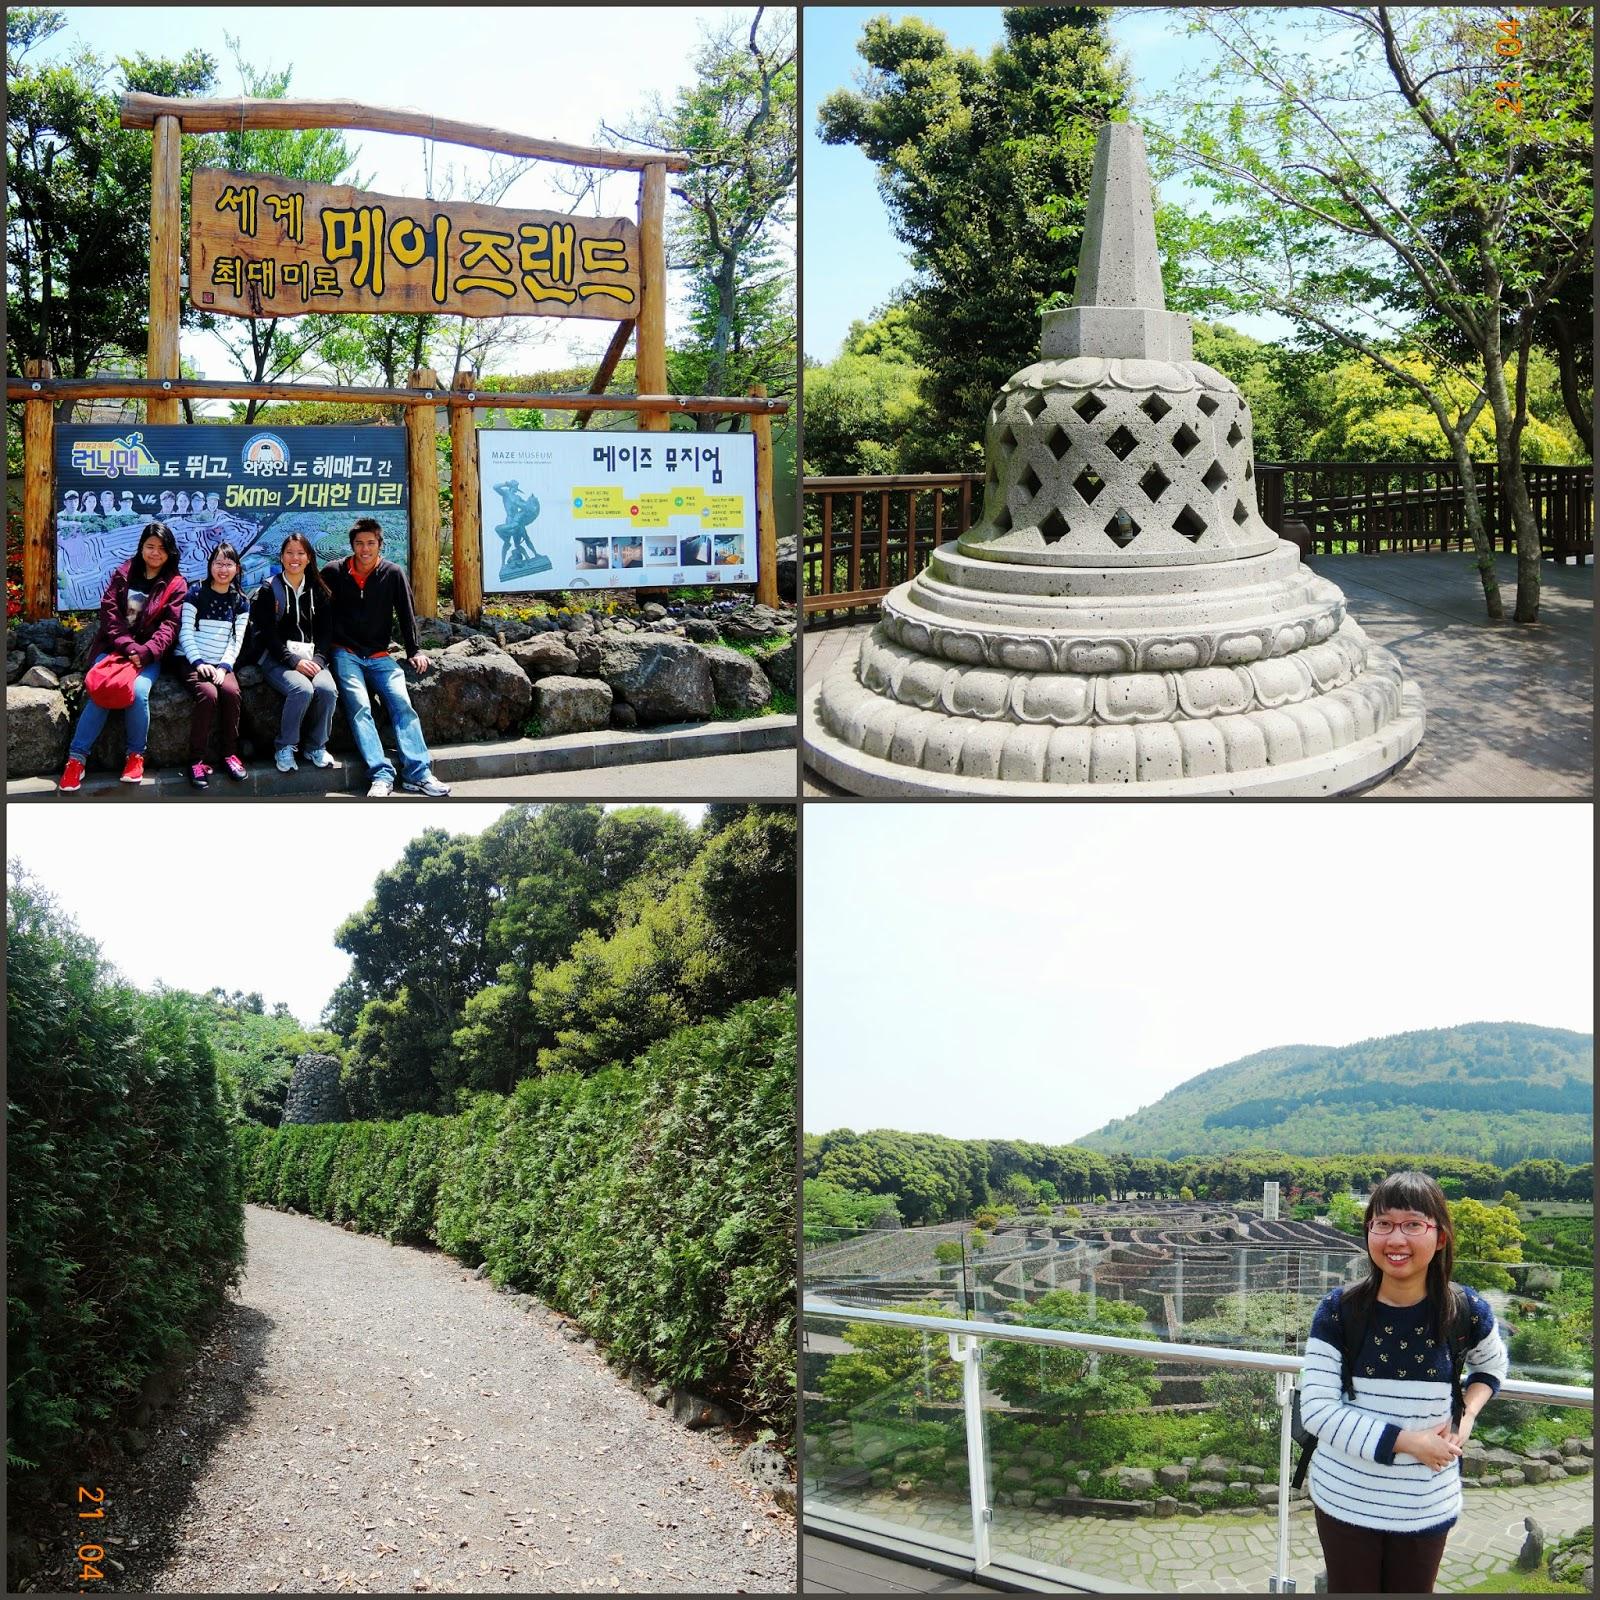 Maze Land Jeju